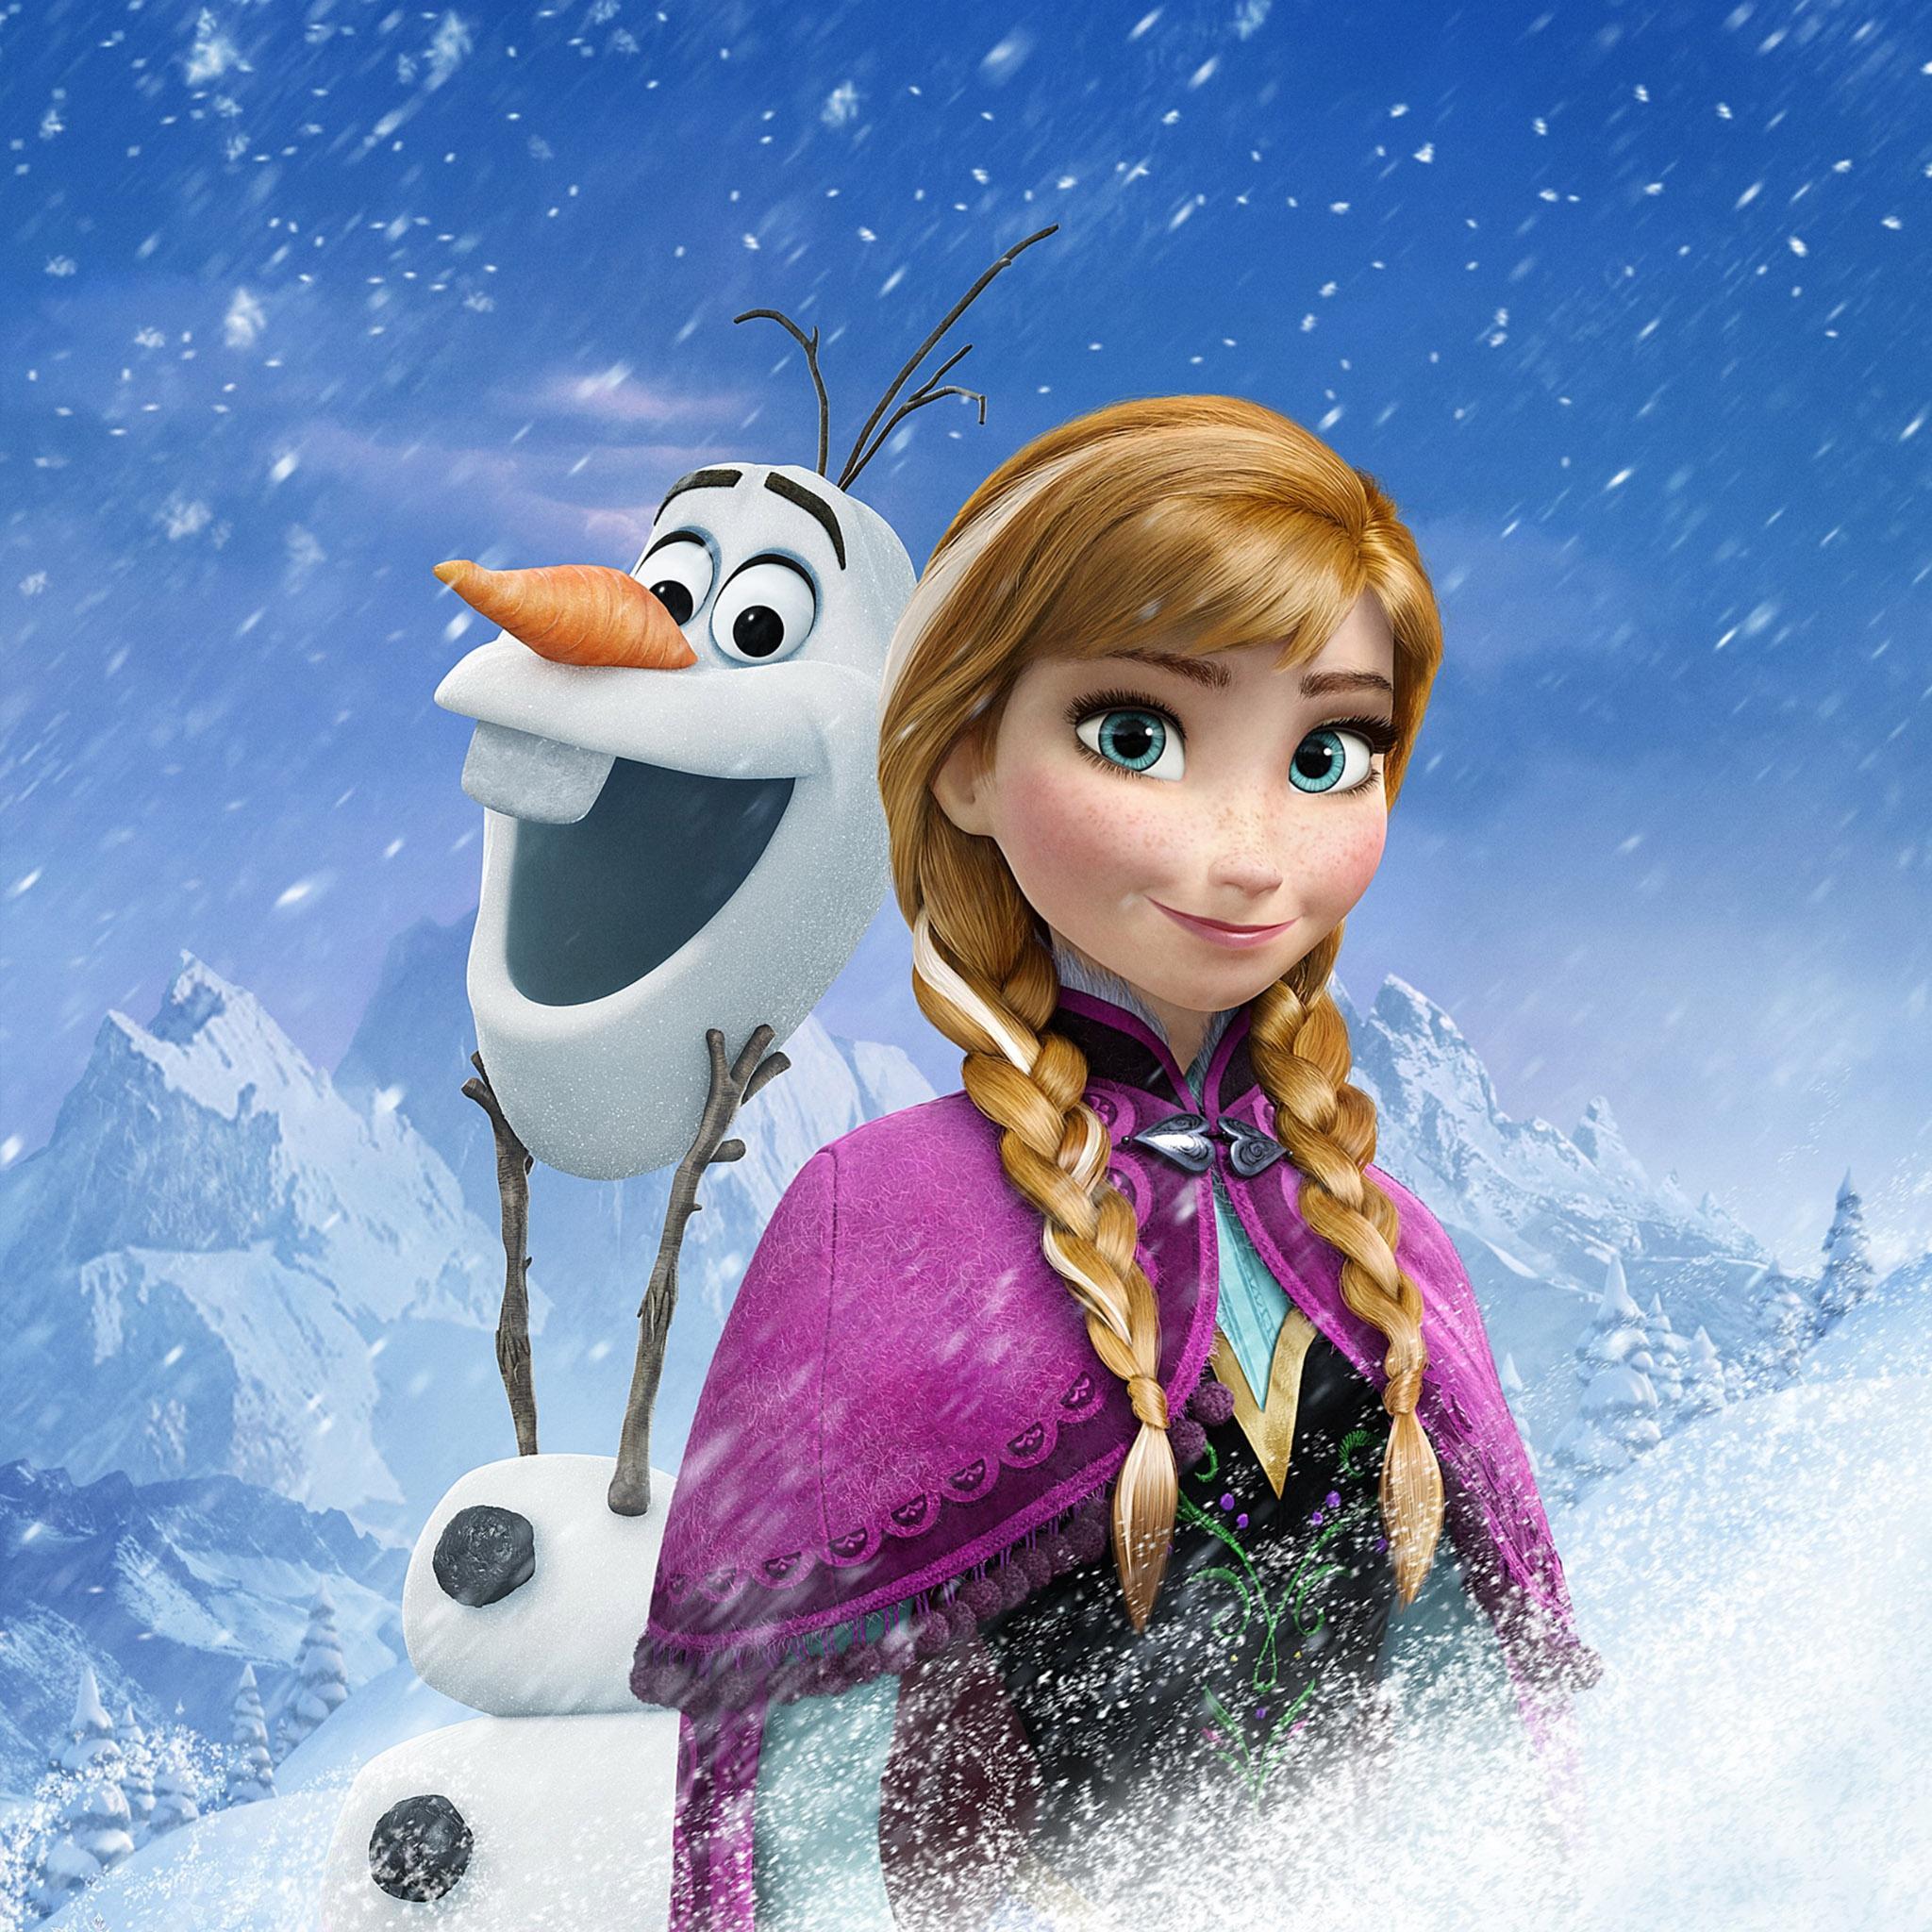 Frozen [iPad] 20482048 Wallpapers for iPad 2048x2048